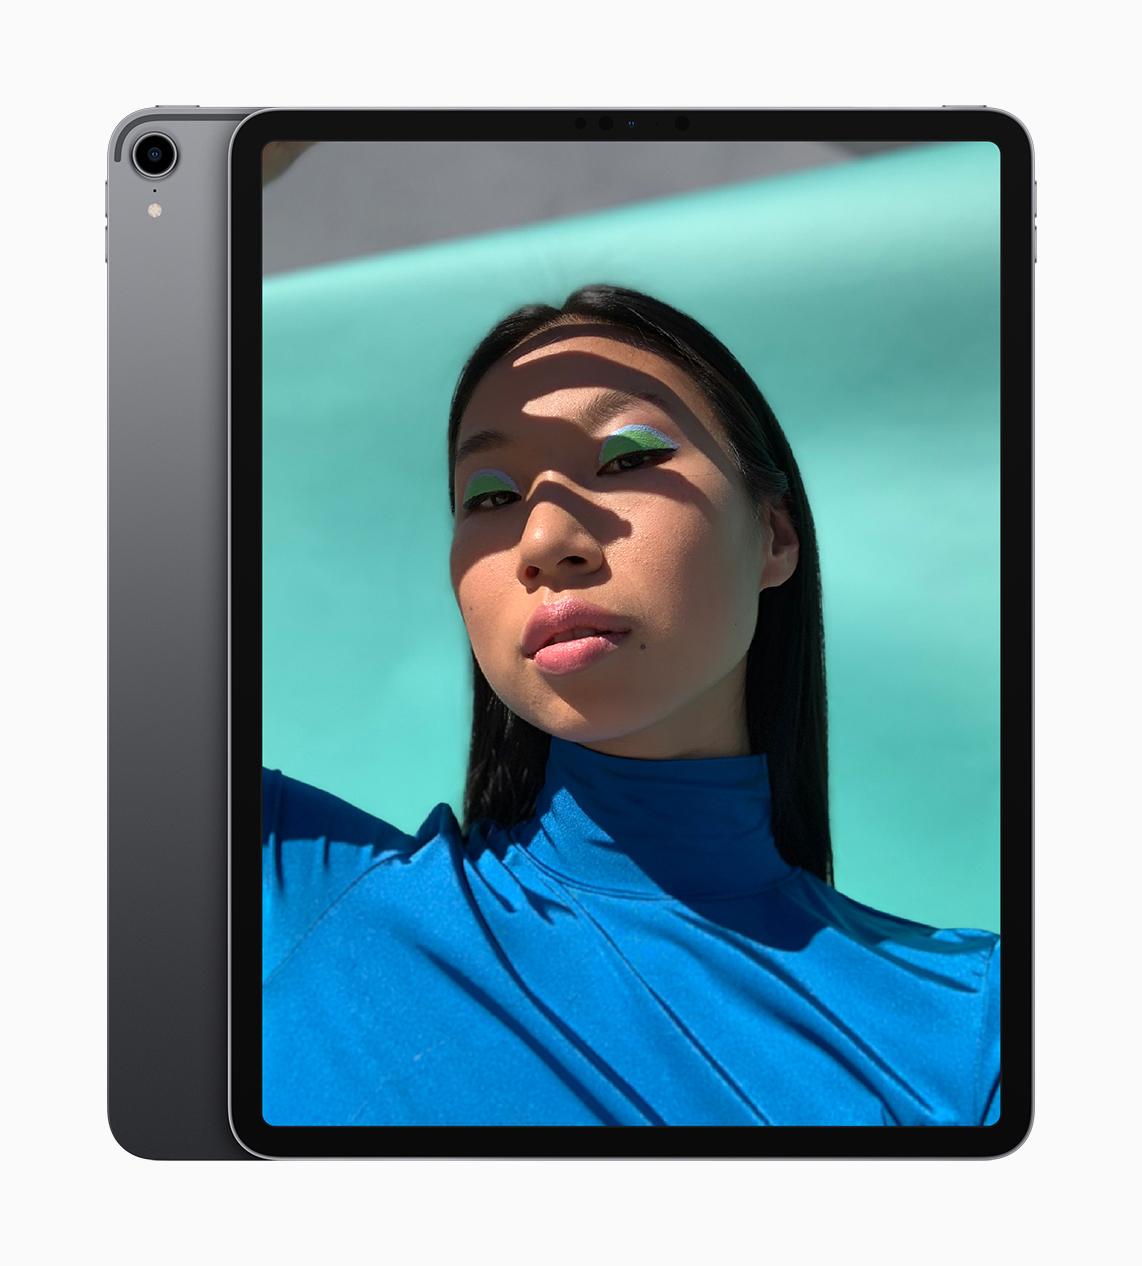 ipad-pro_large-display_10302018_inline-jpg-large_2x-2